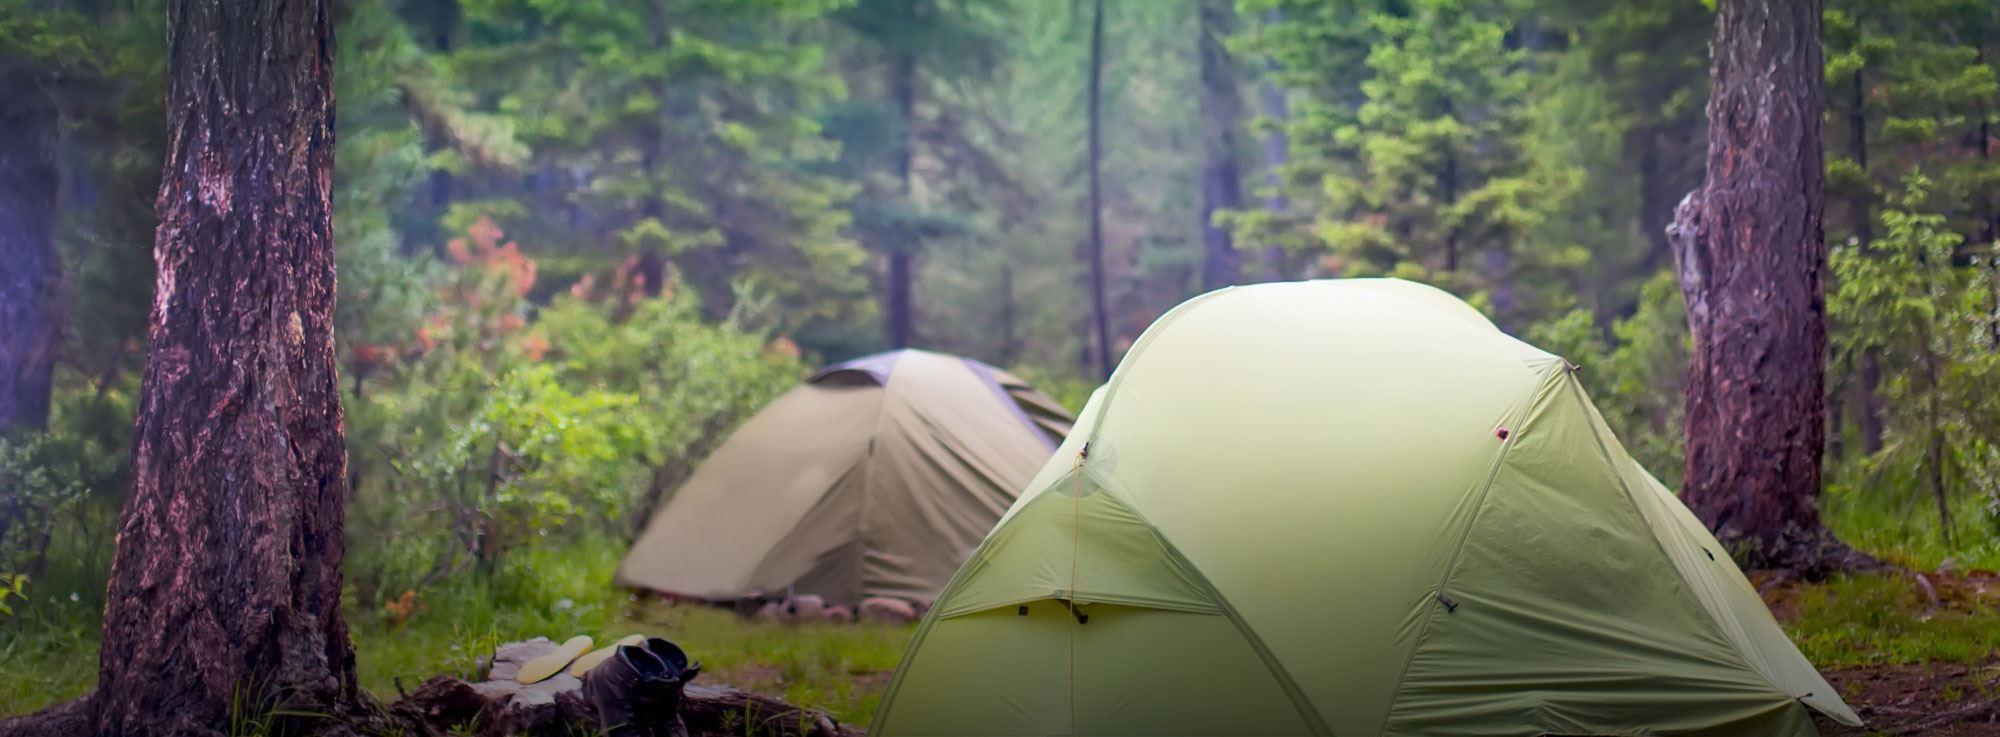 puglia-campeggi